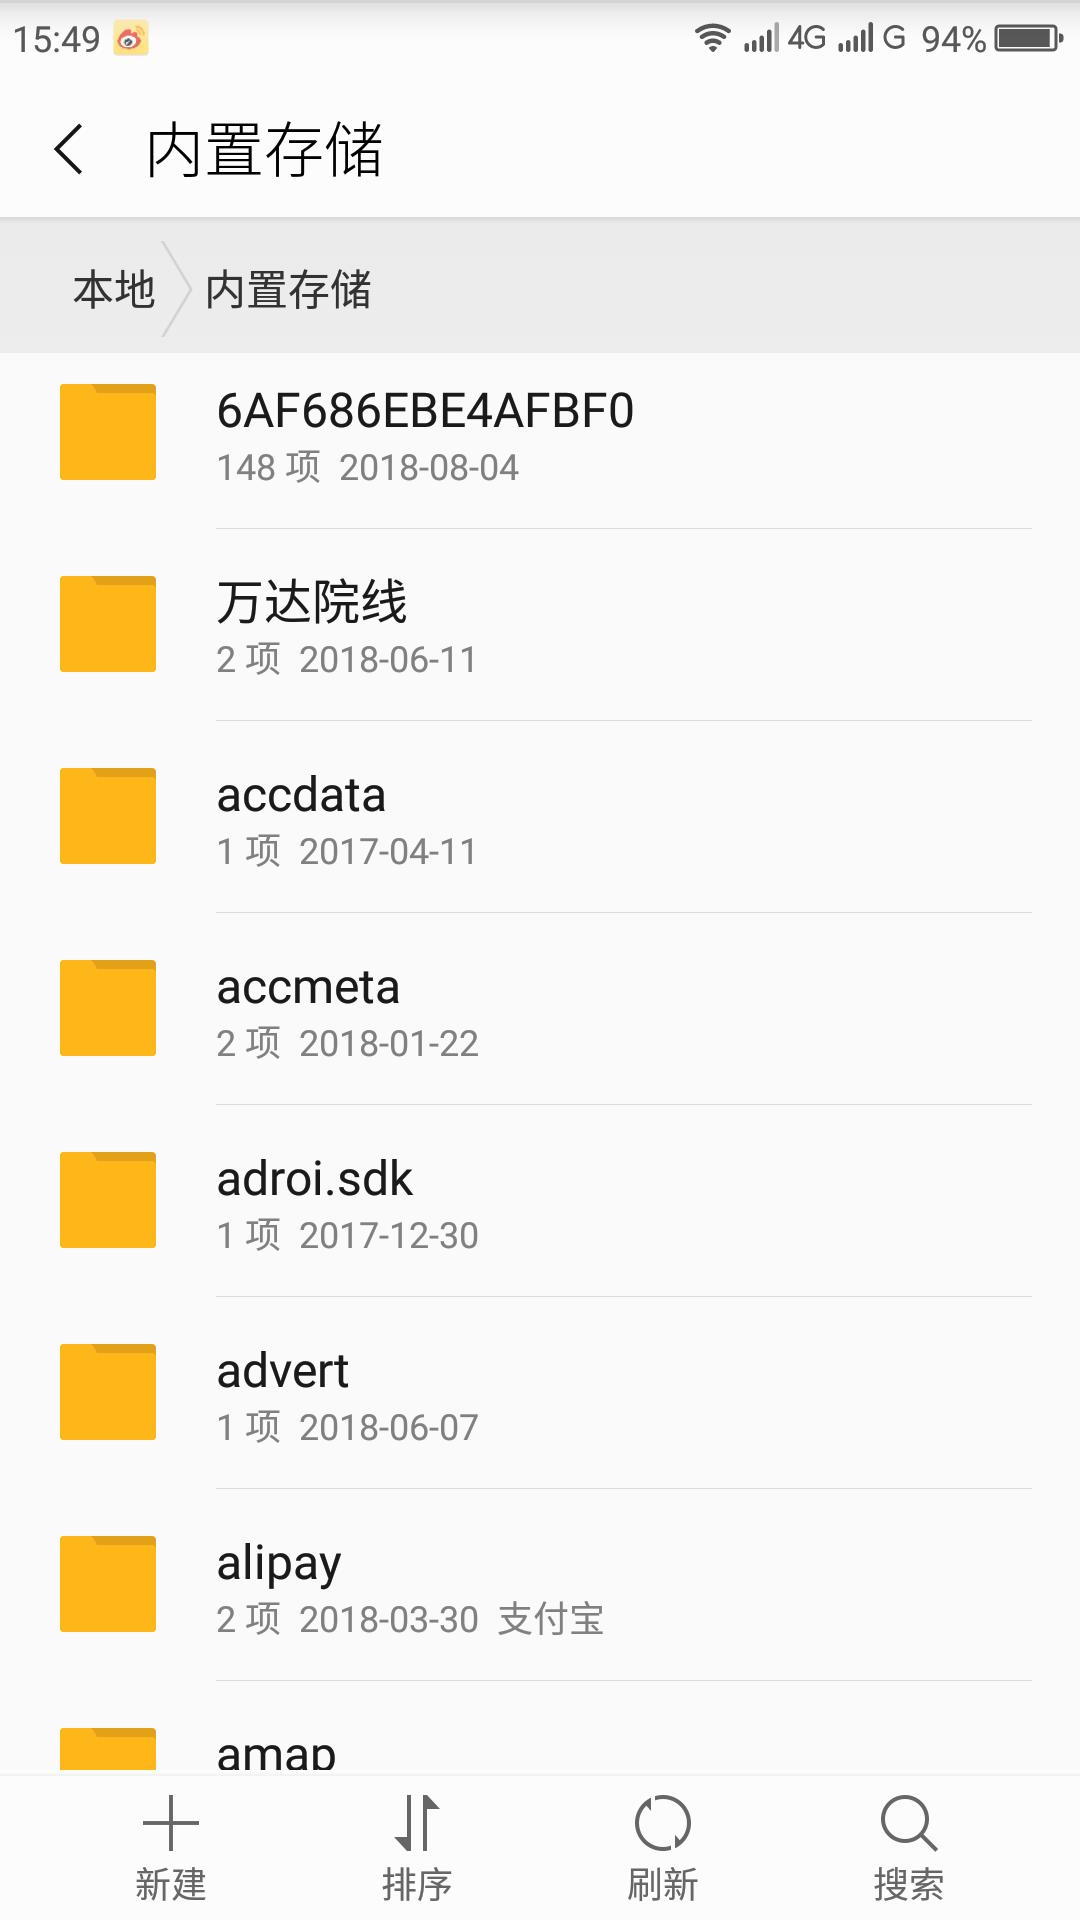 Screenshot_2018-08-06-15-49-10.png